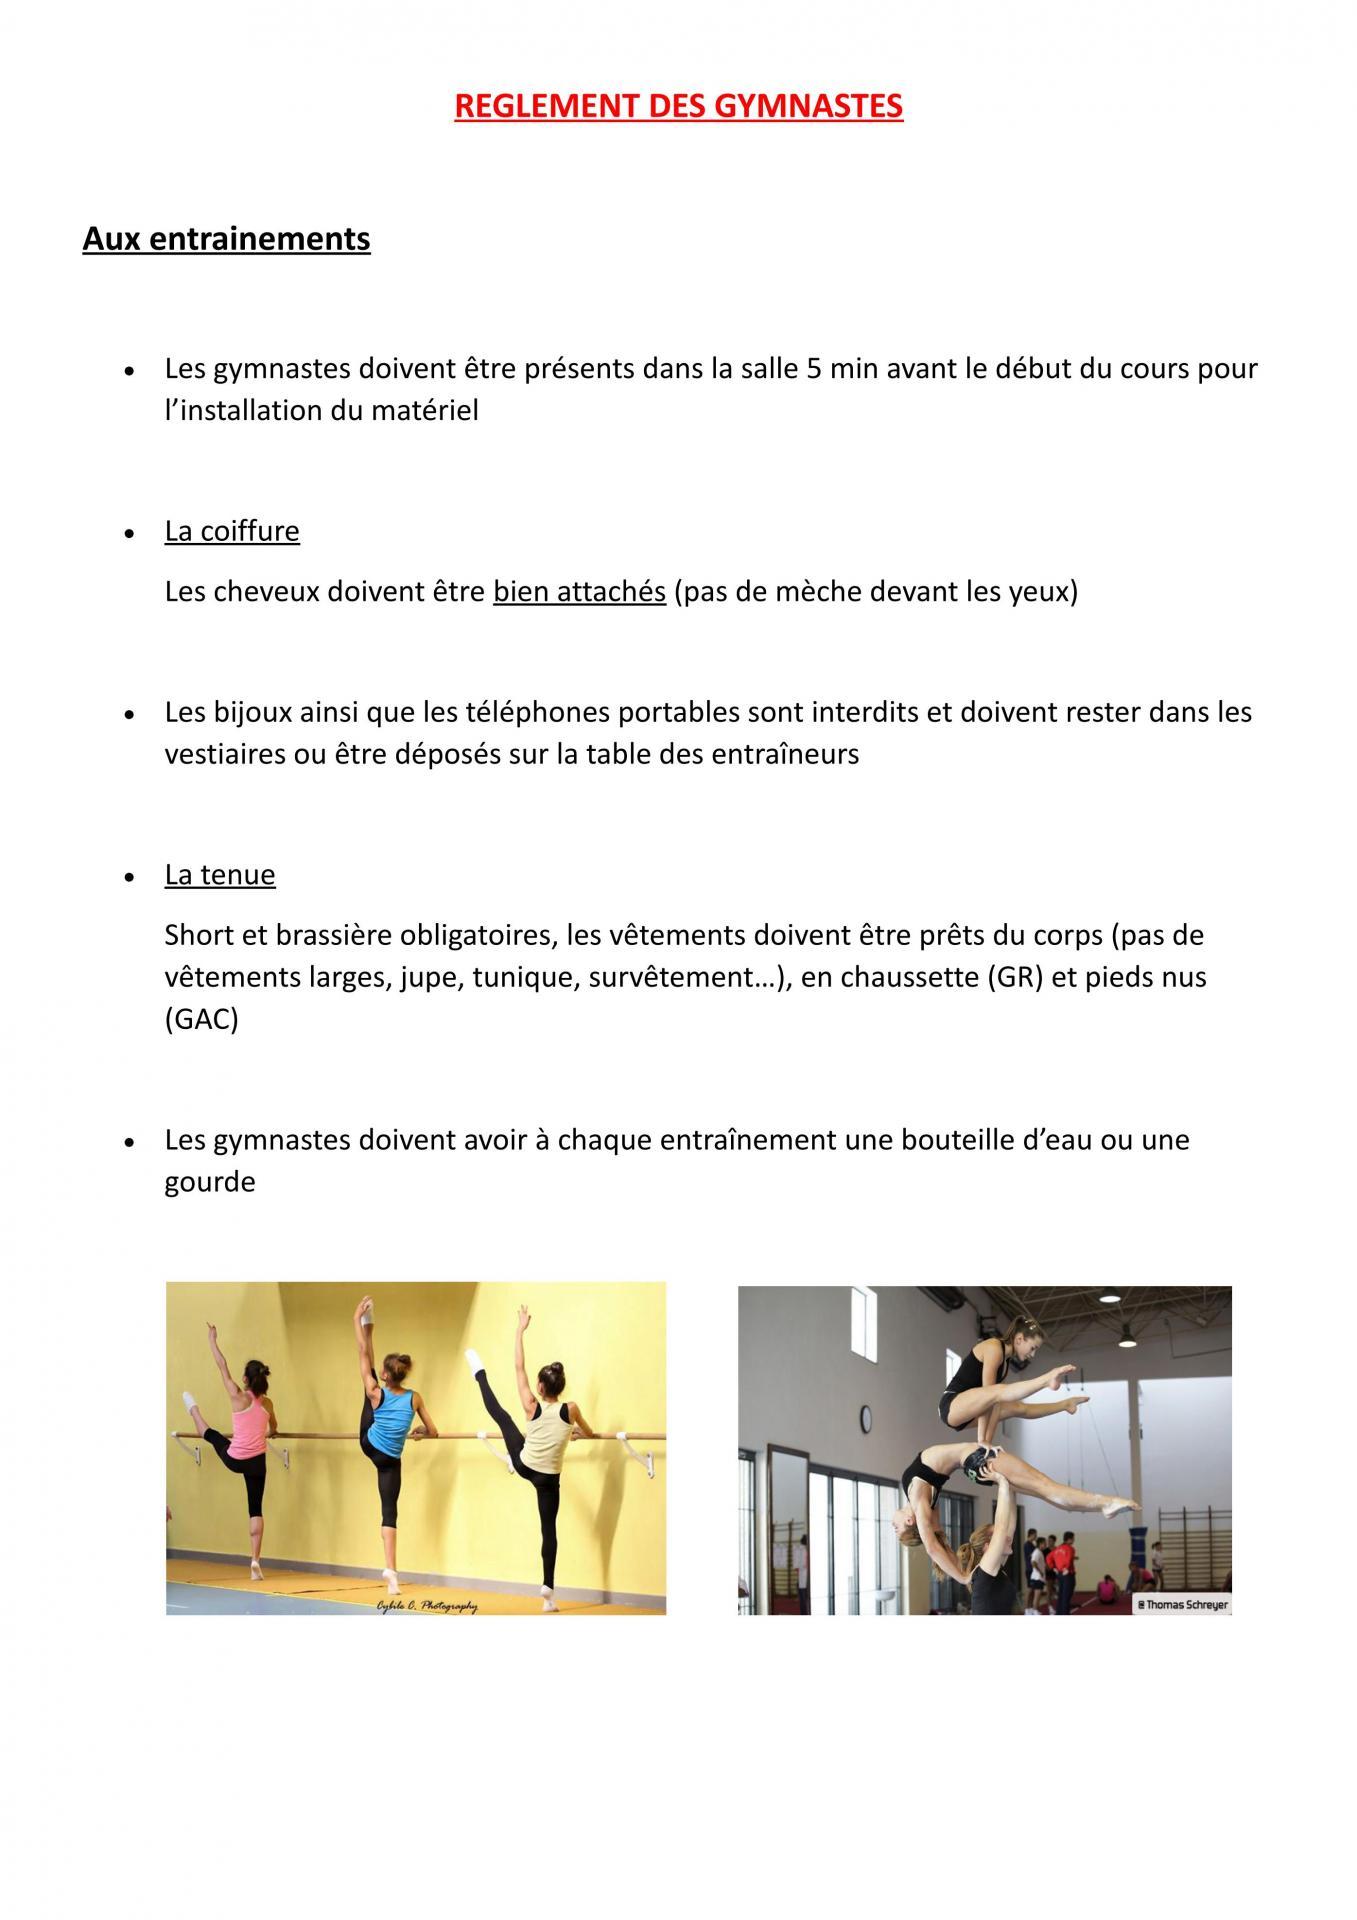 Reglement des gymnastes 01